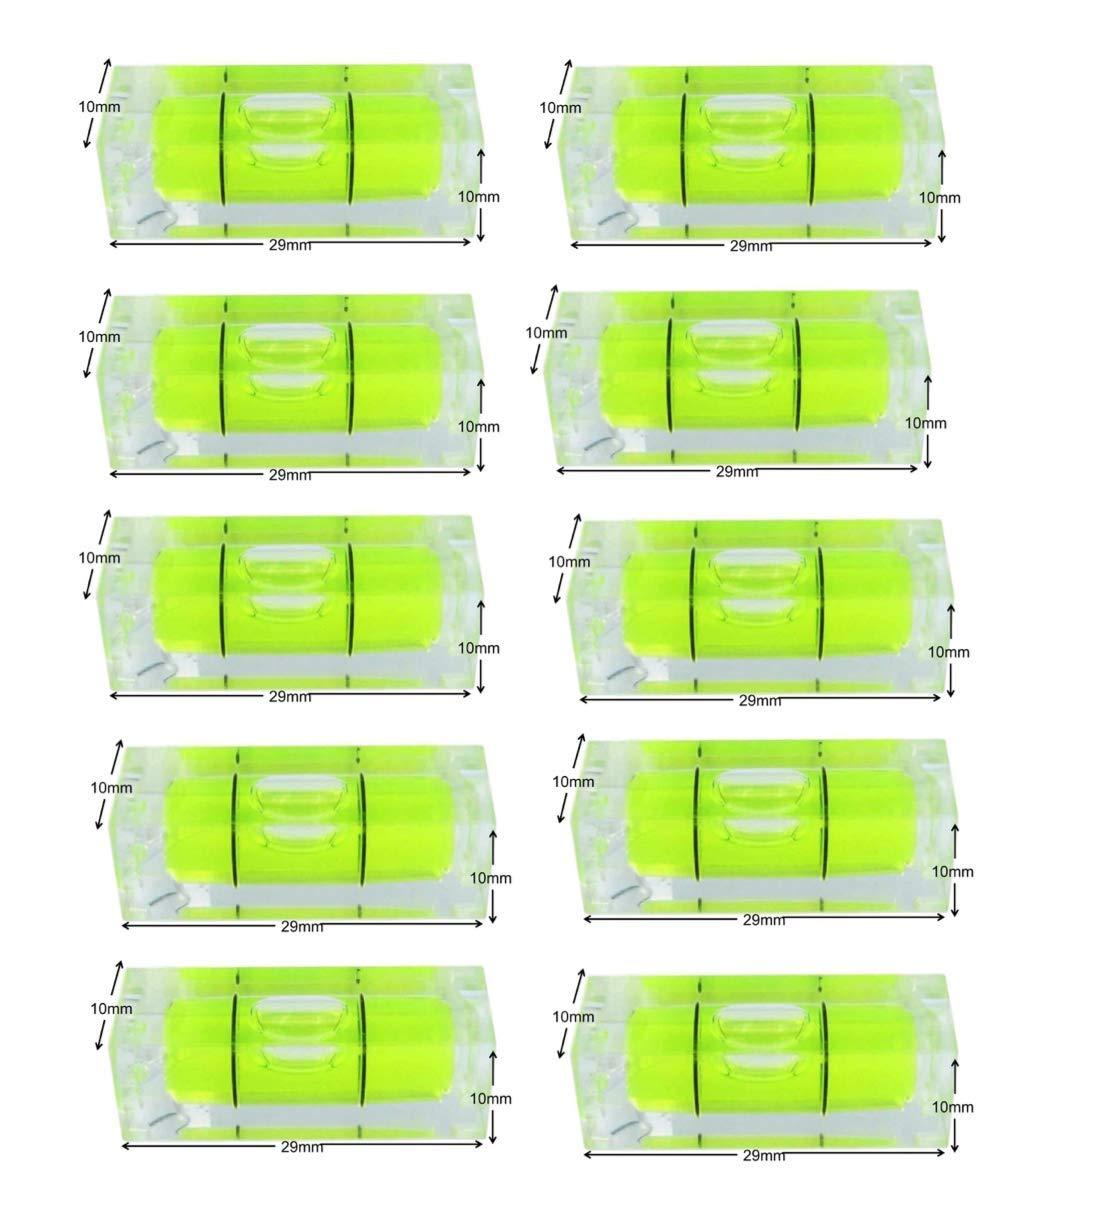 10x10x29mm Green Color Mini Spirit Level Bubble Spirit Level Square Level Frame 2